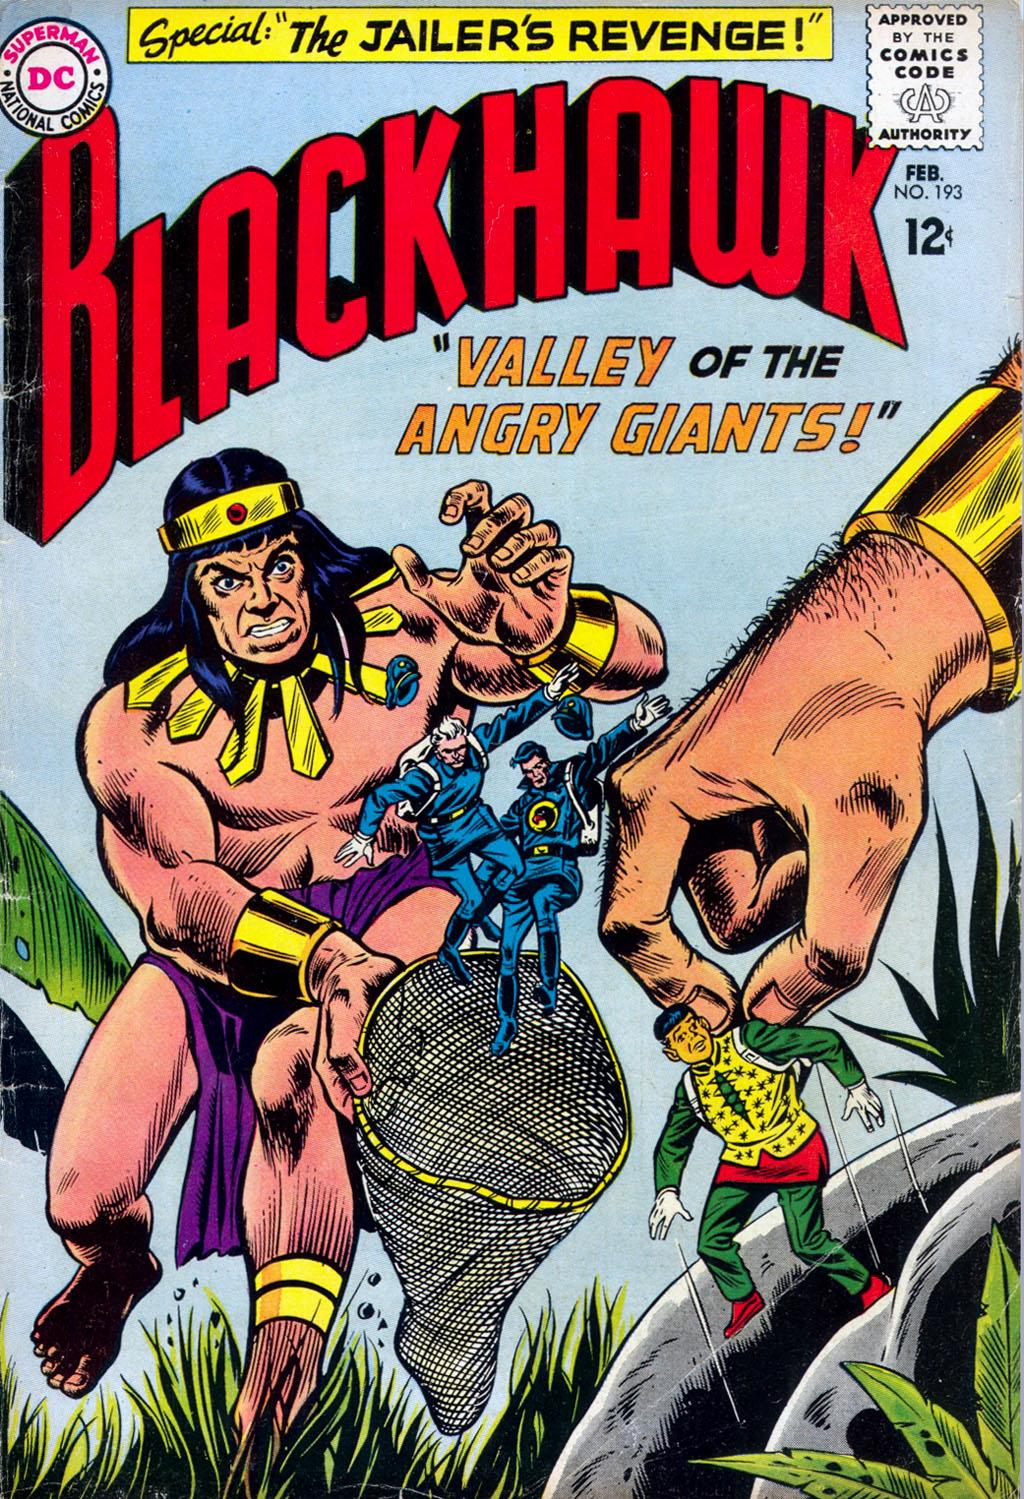 Blackhawk (1957) 193 Page 1